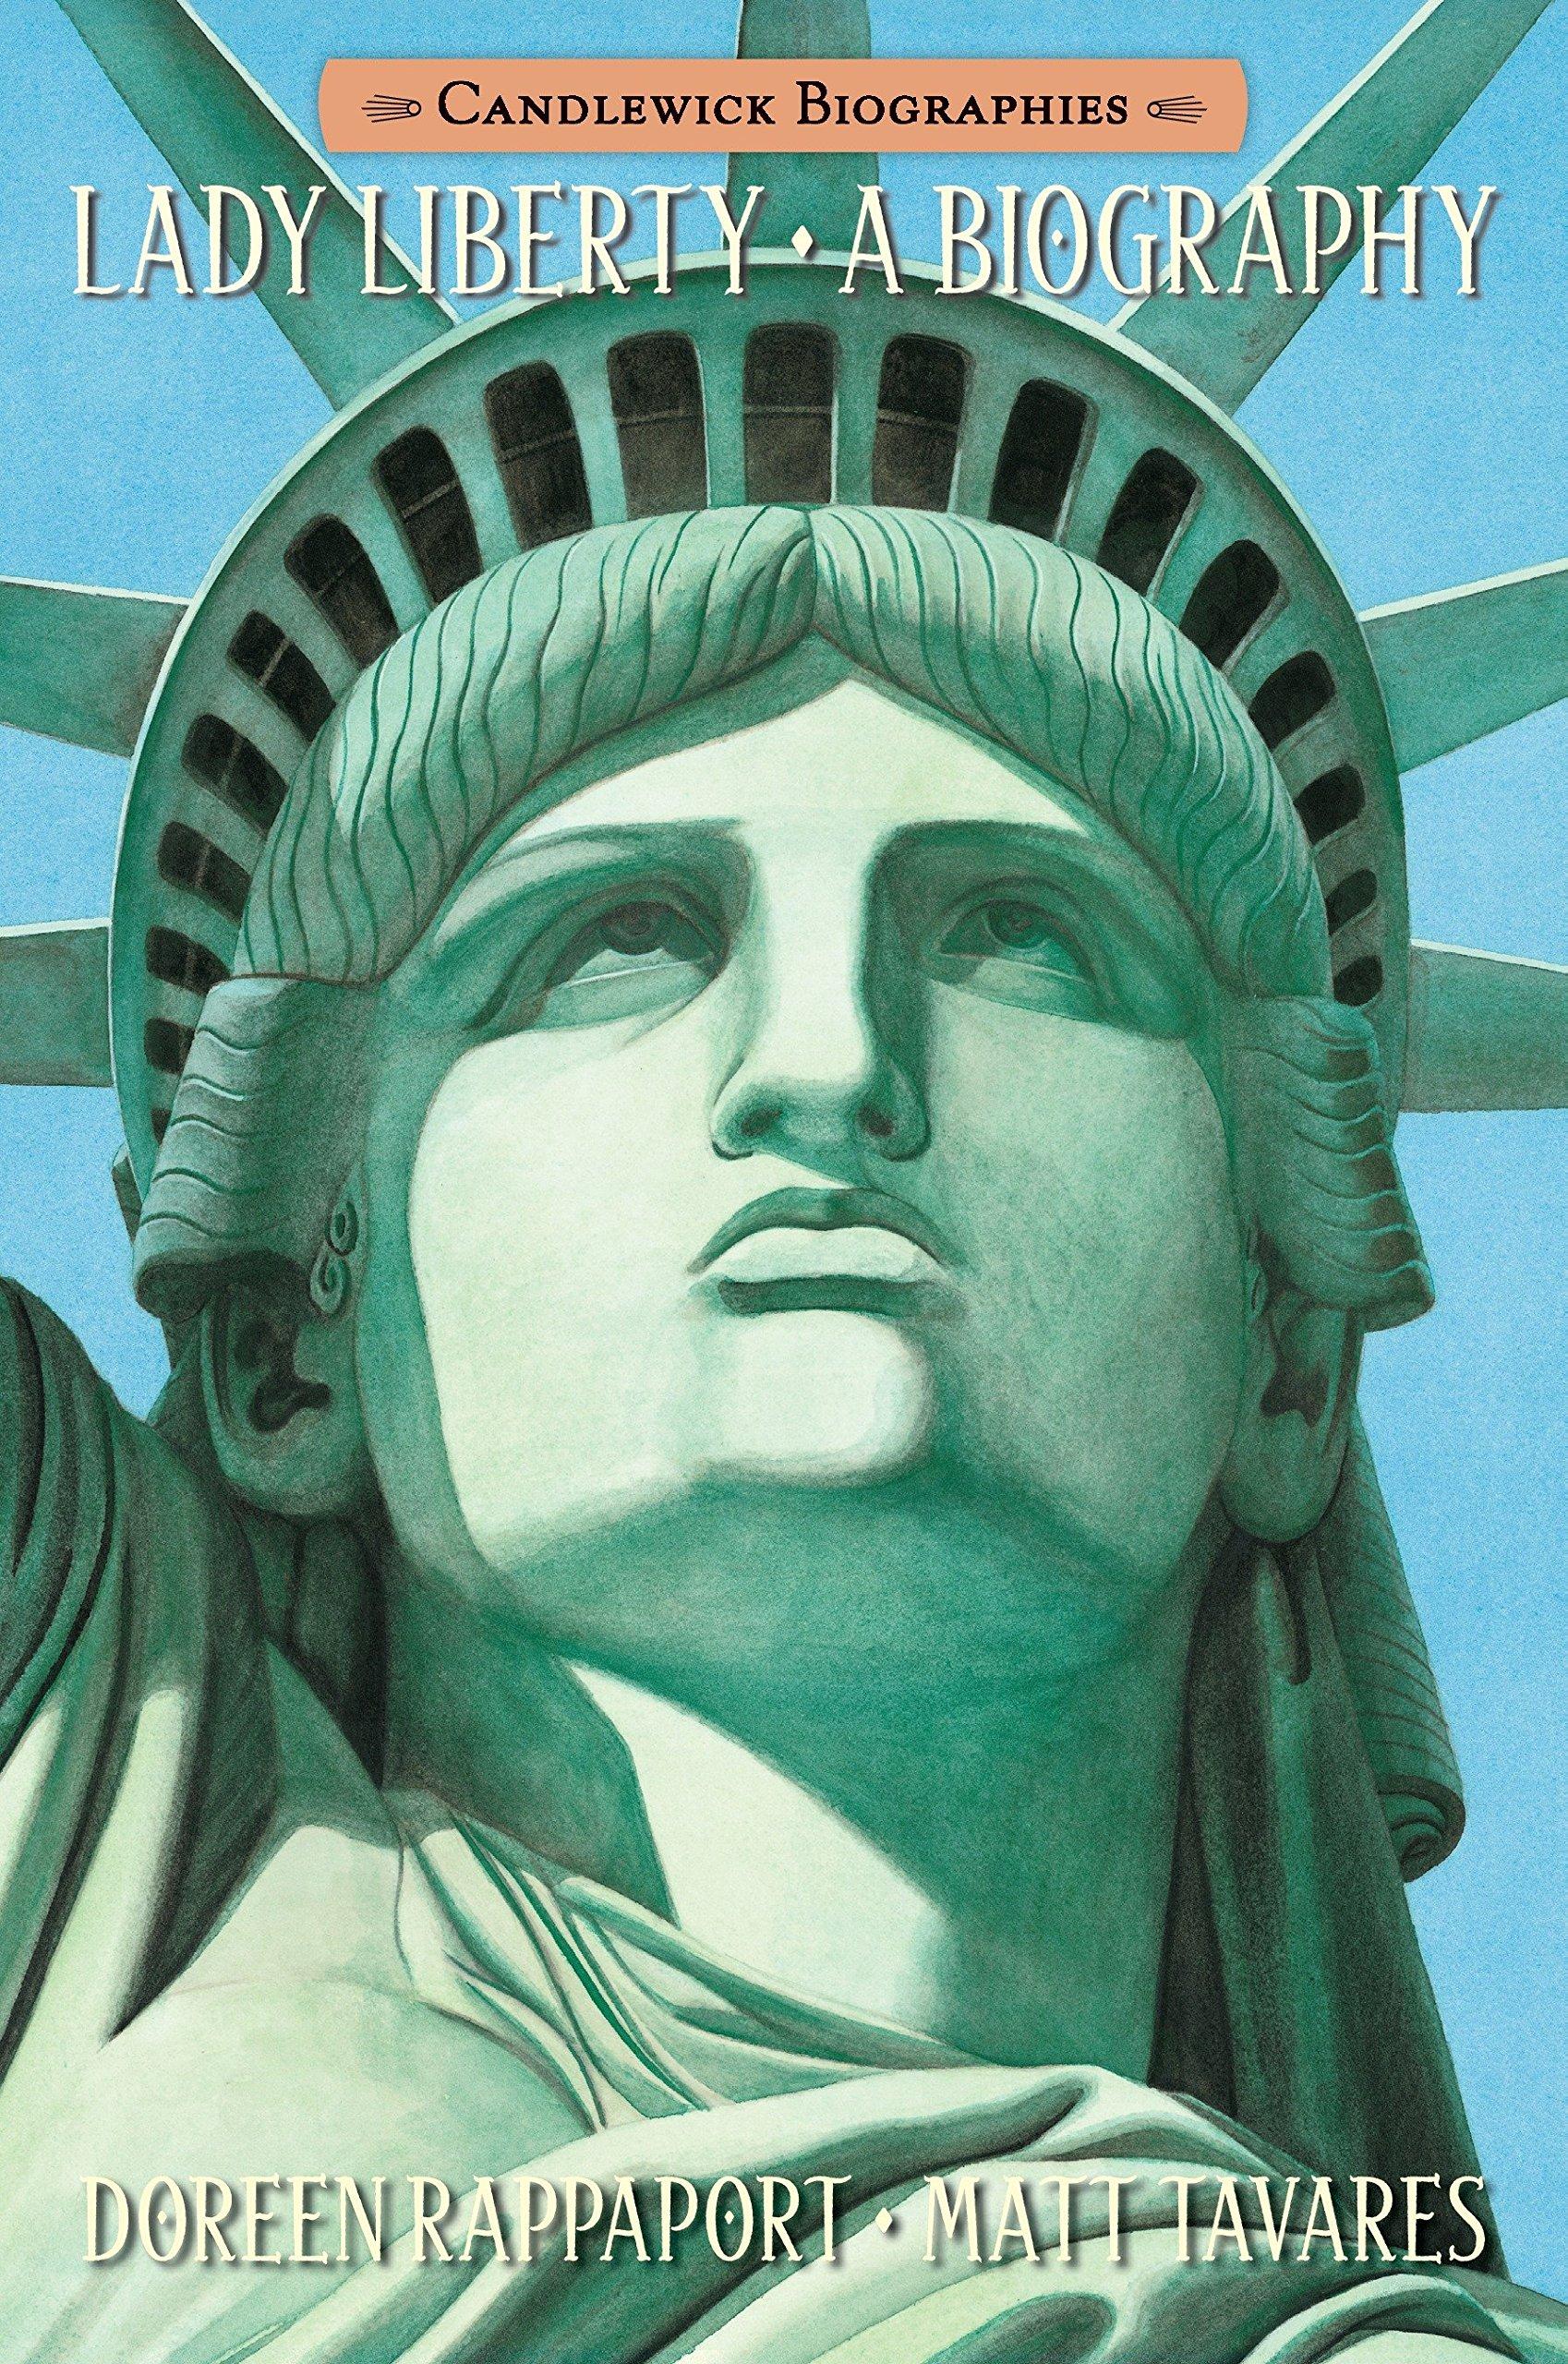 Lady Liberty Candlewick Biographies A Biography Rappaport Doreen Tavares Matt 9780763671150 Amazon Com Books